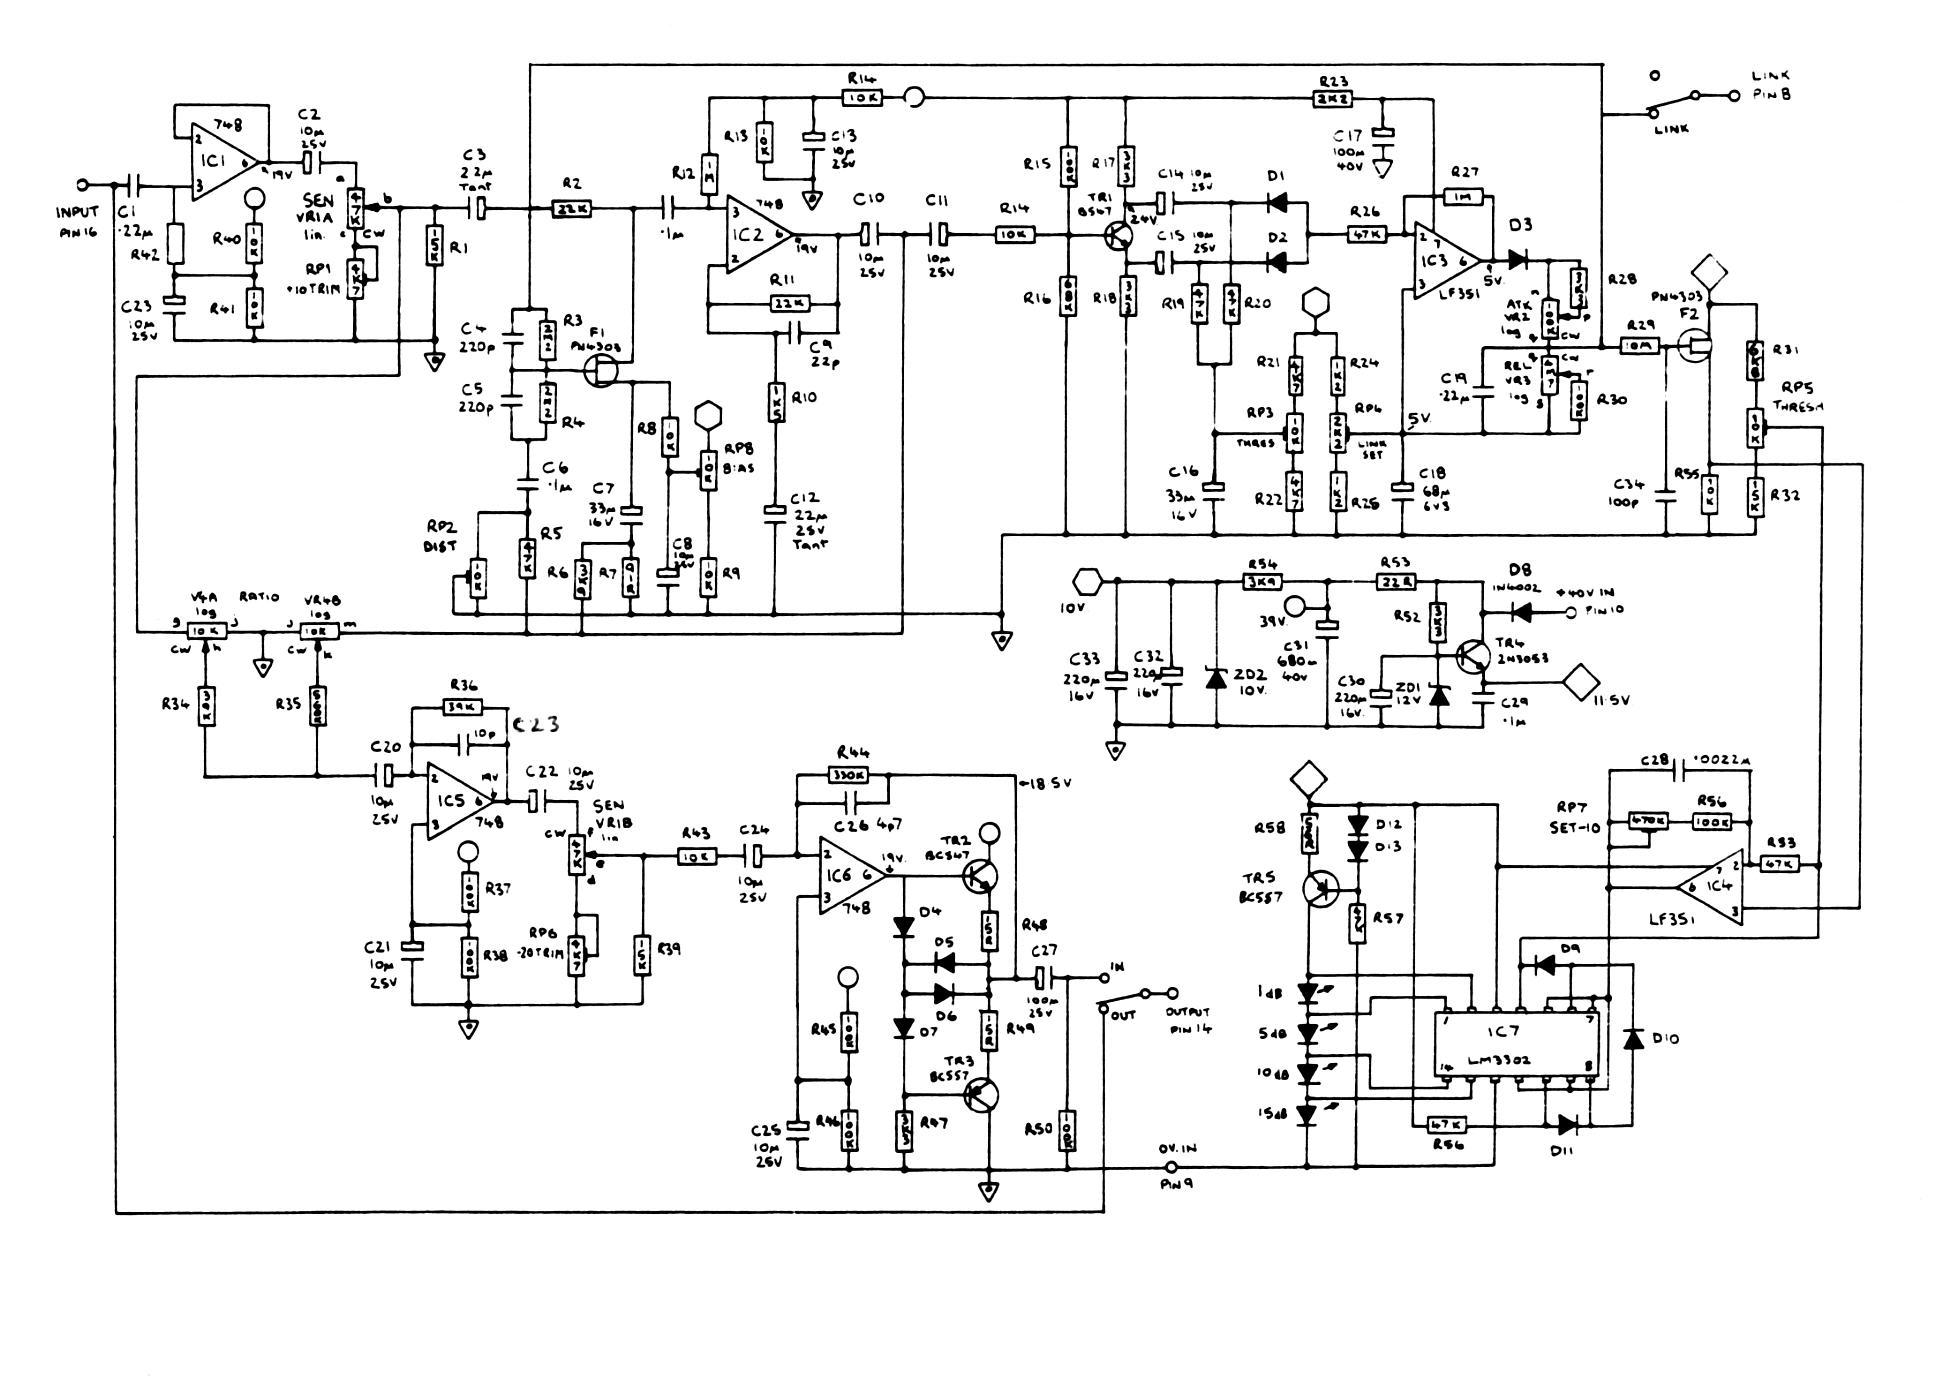 extra m2n61 arpc fan wiring diagram